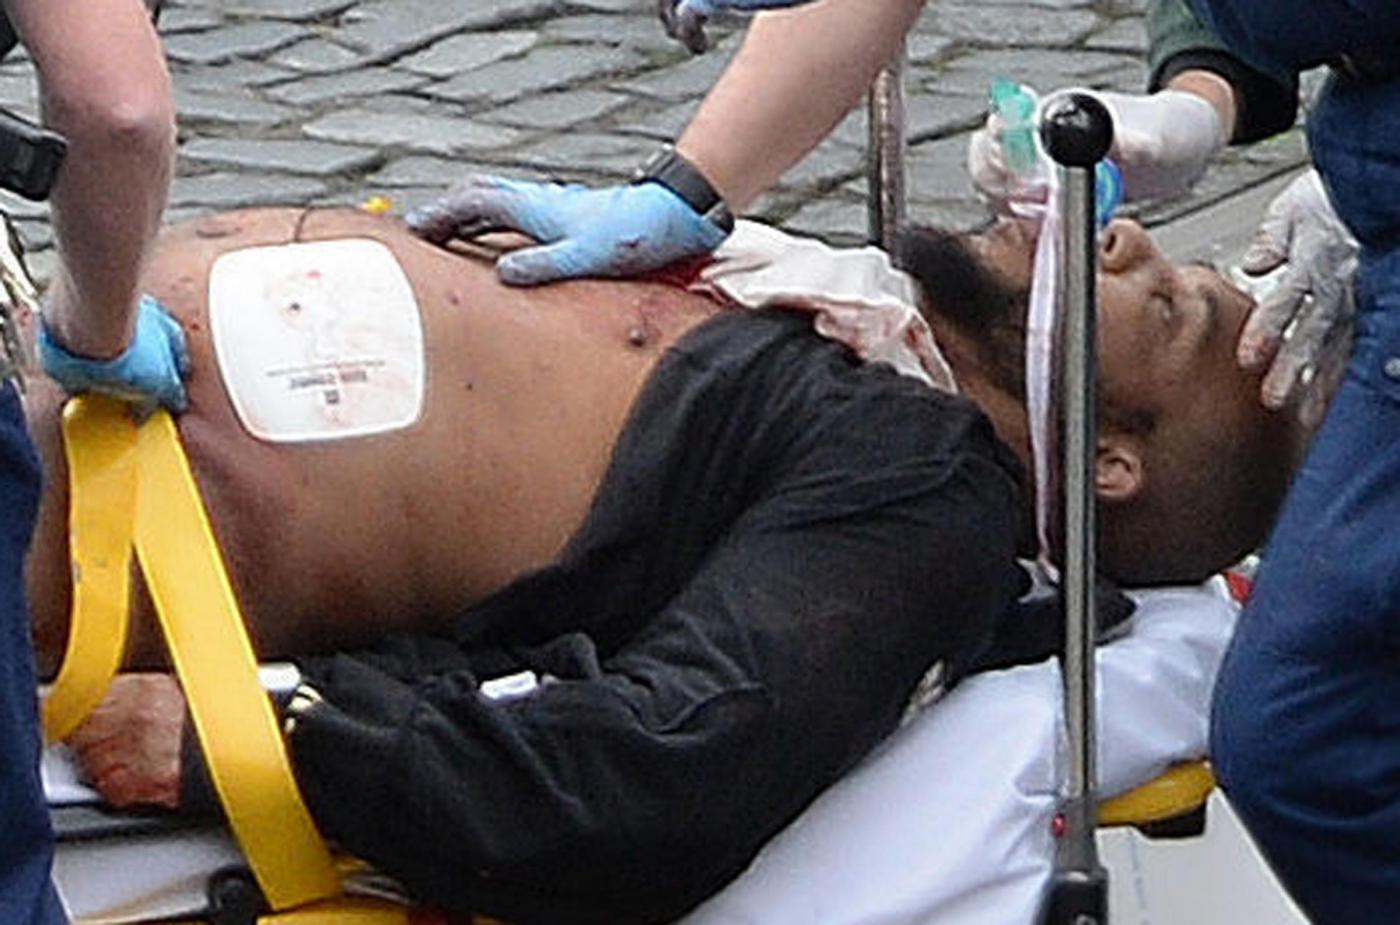 Attentato Londra 22 marzo 2017: chi era Khalid Masood, killer noto ai servizi segreti